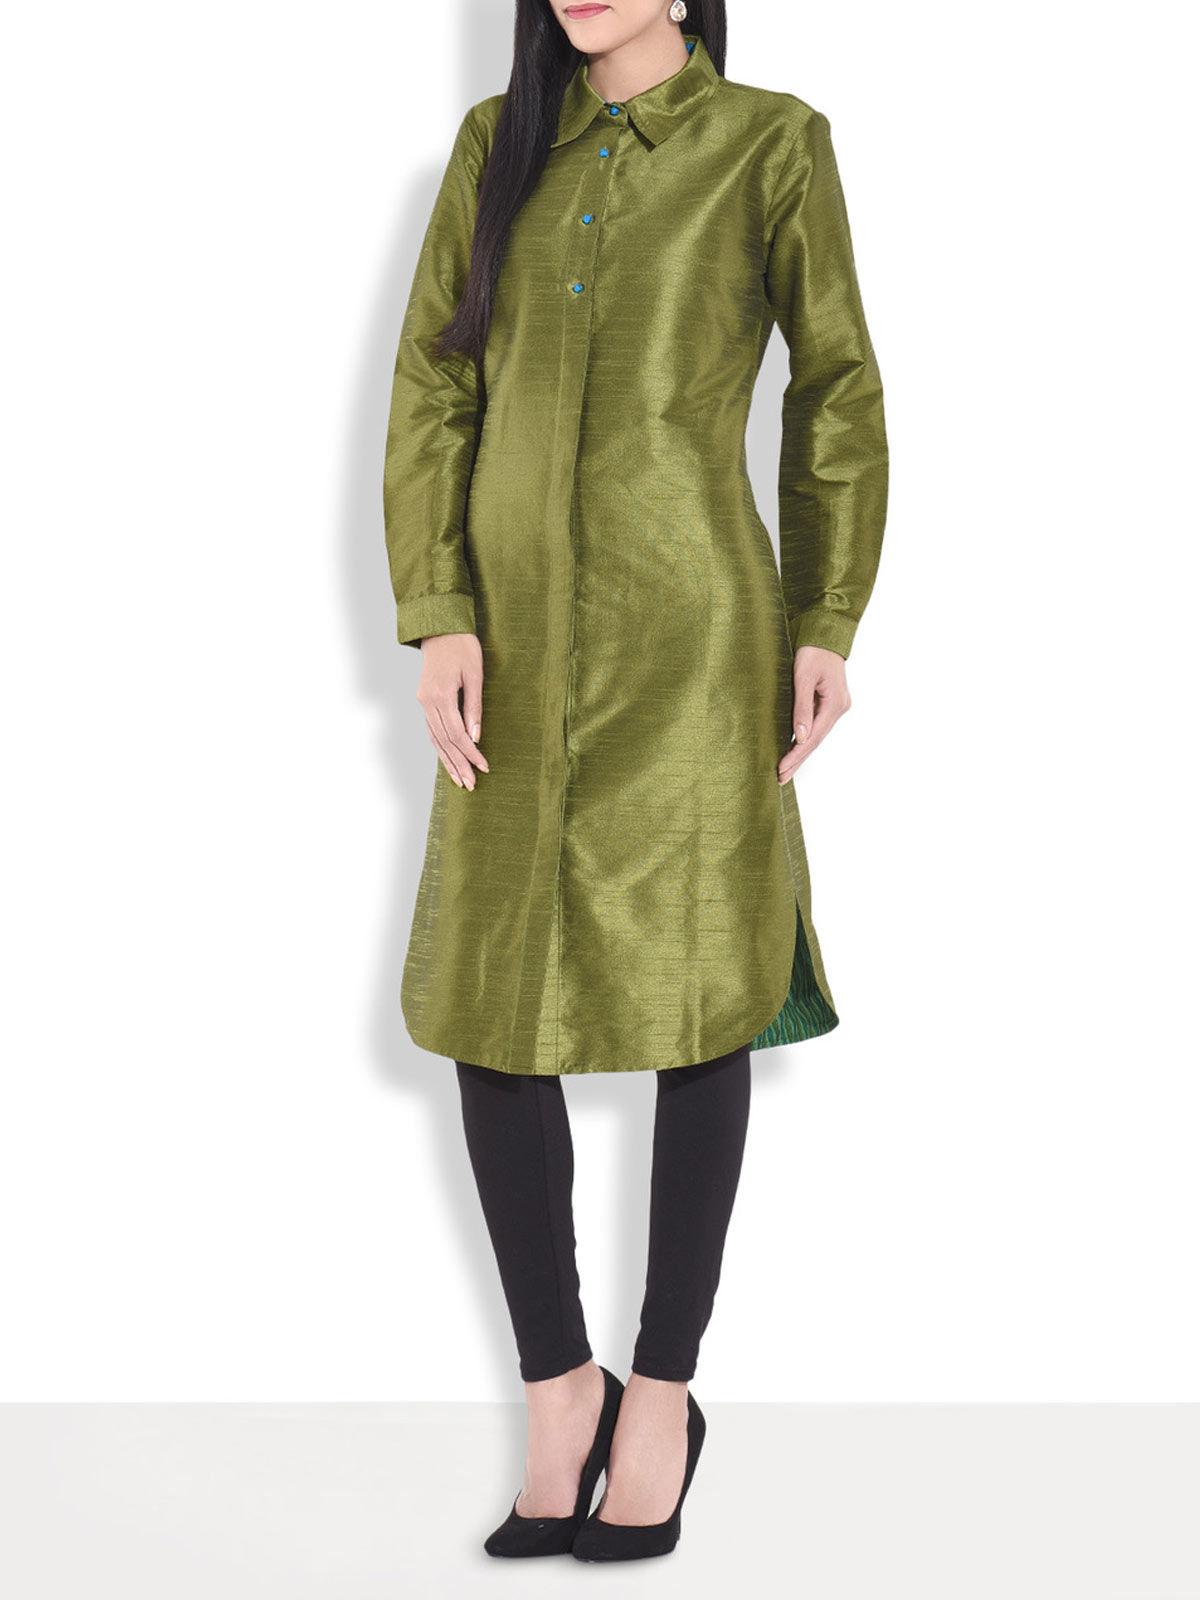 Raw silk collared kurta